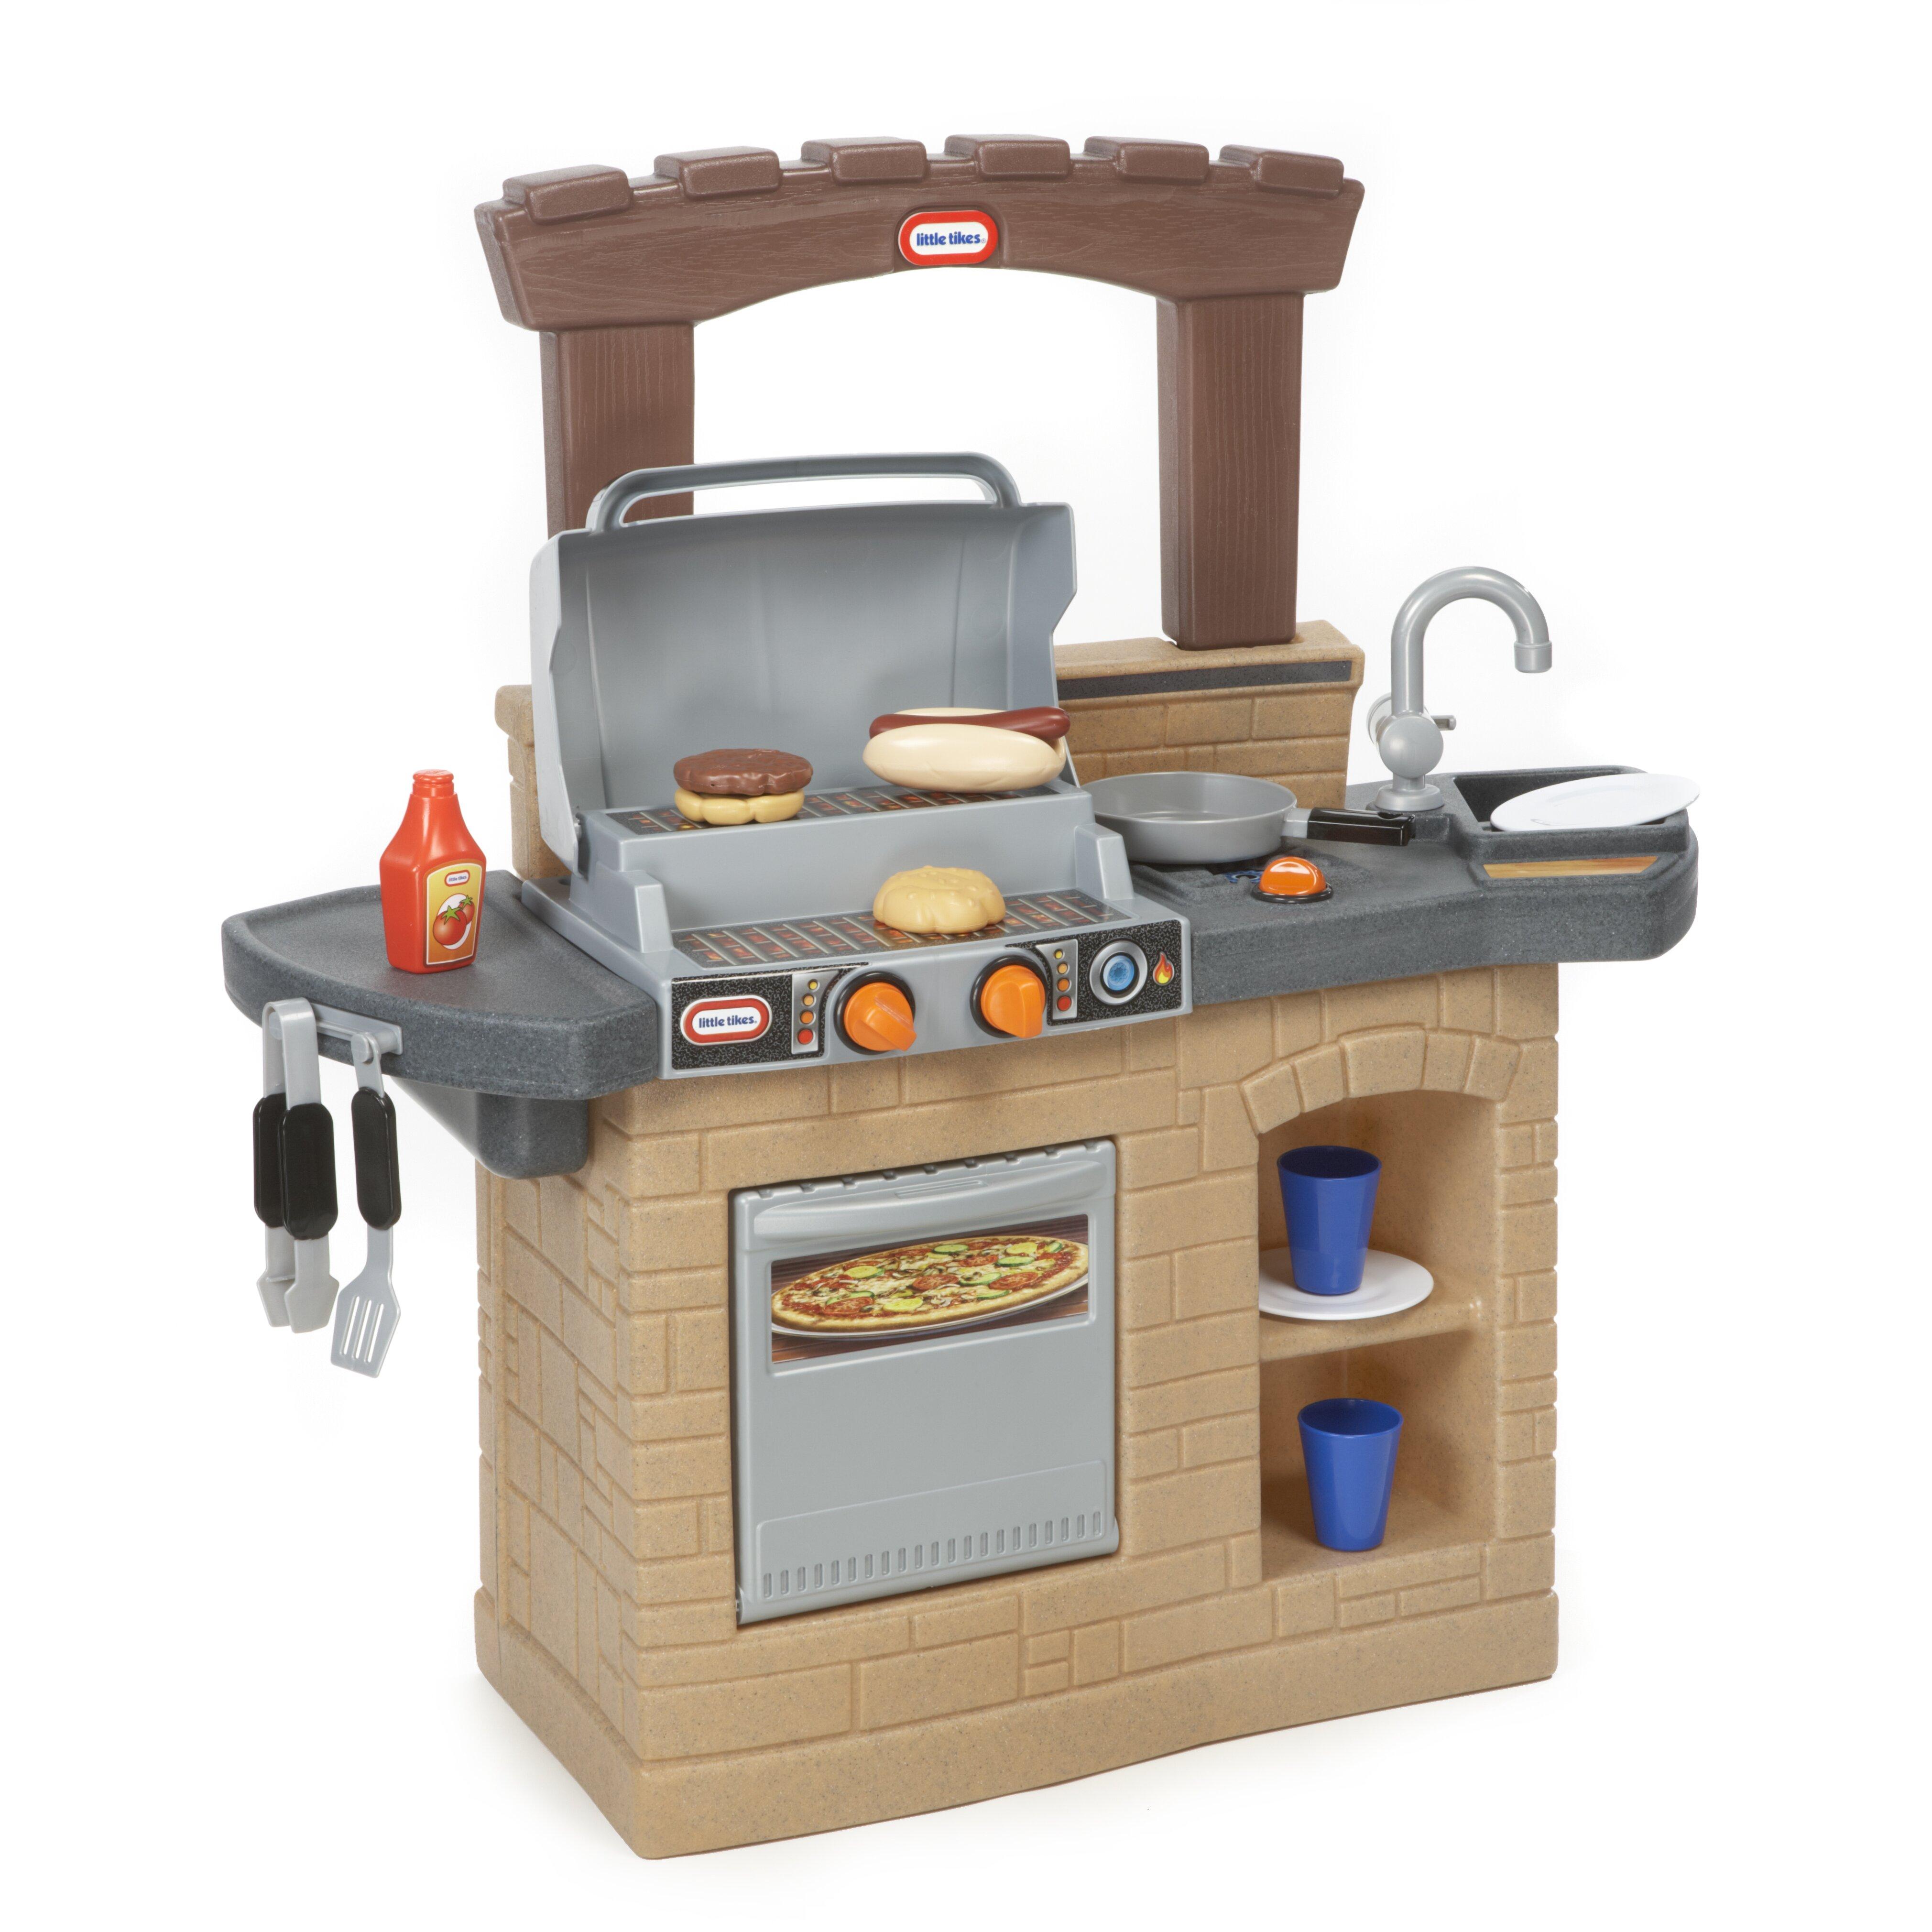 little tikes cook 'n play outdoor bbq™ kitchen set & reviews | wayfair